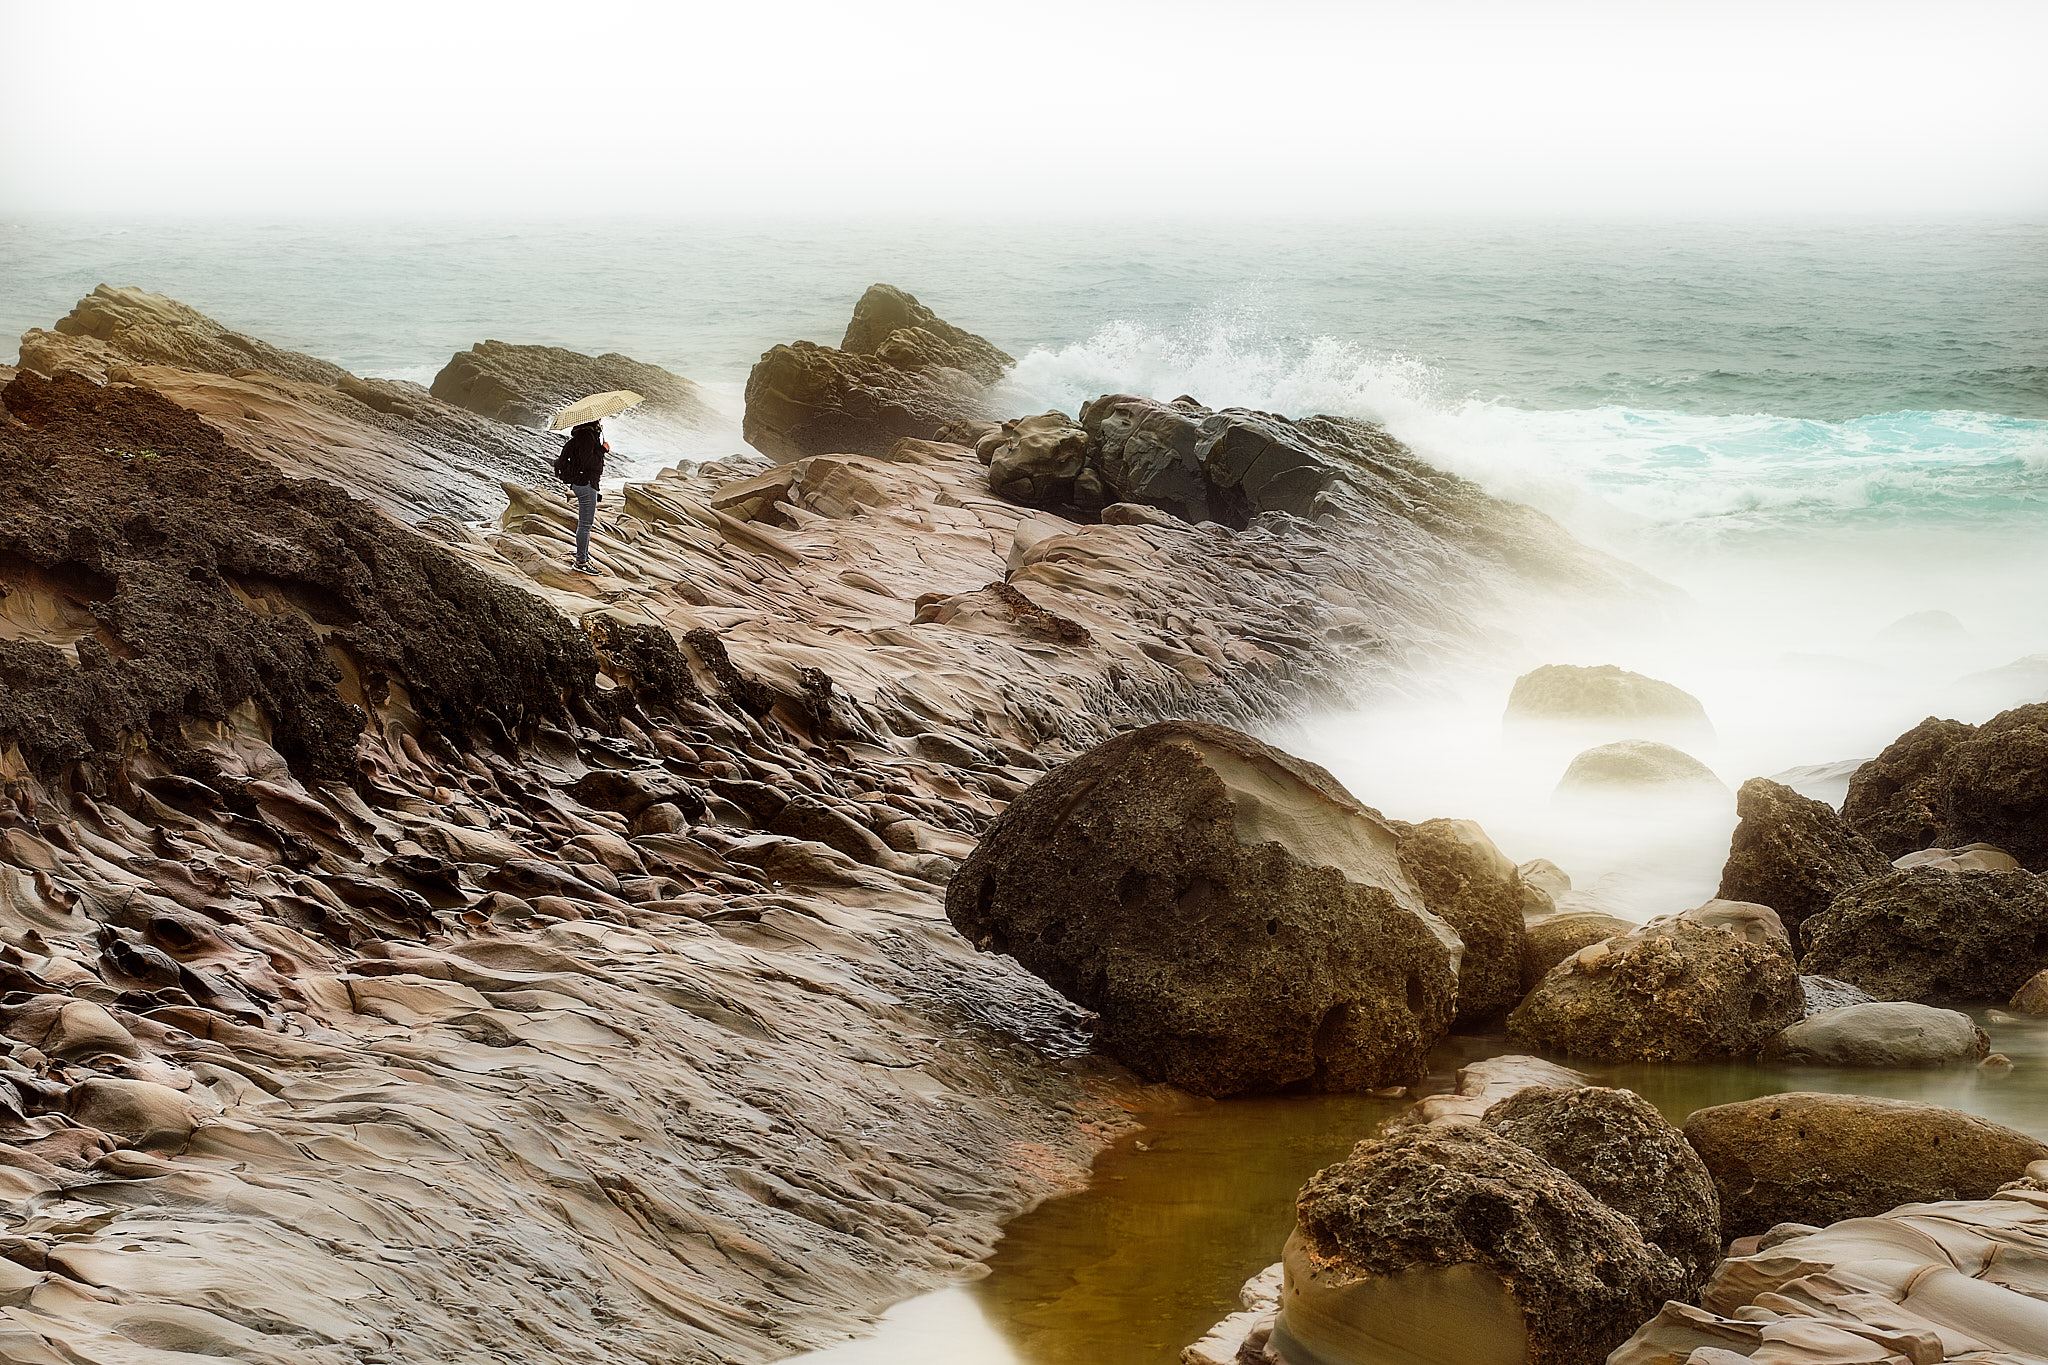 Contemplating the Waves.Fujifilm XT2 - XF90mmF2